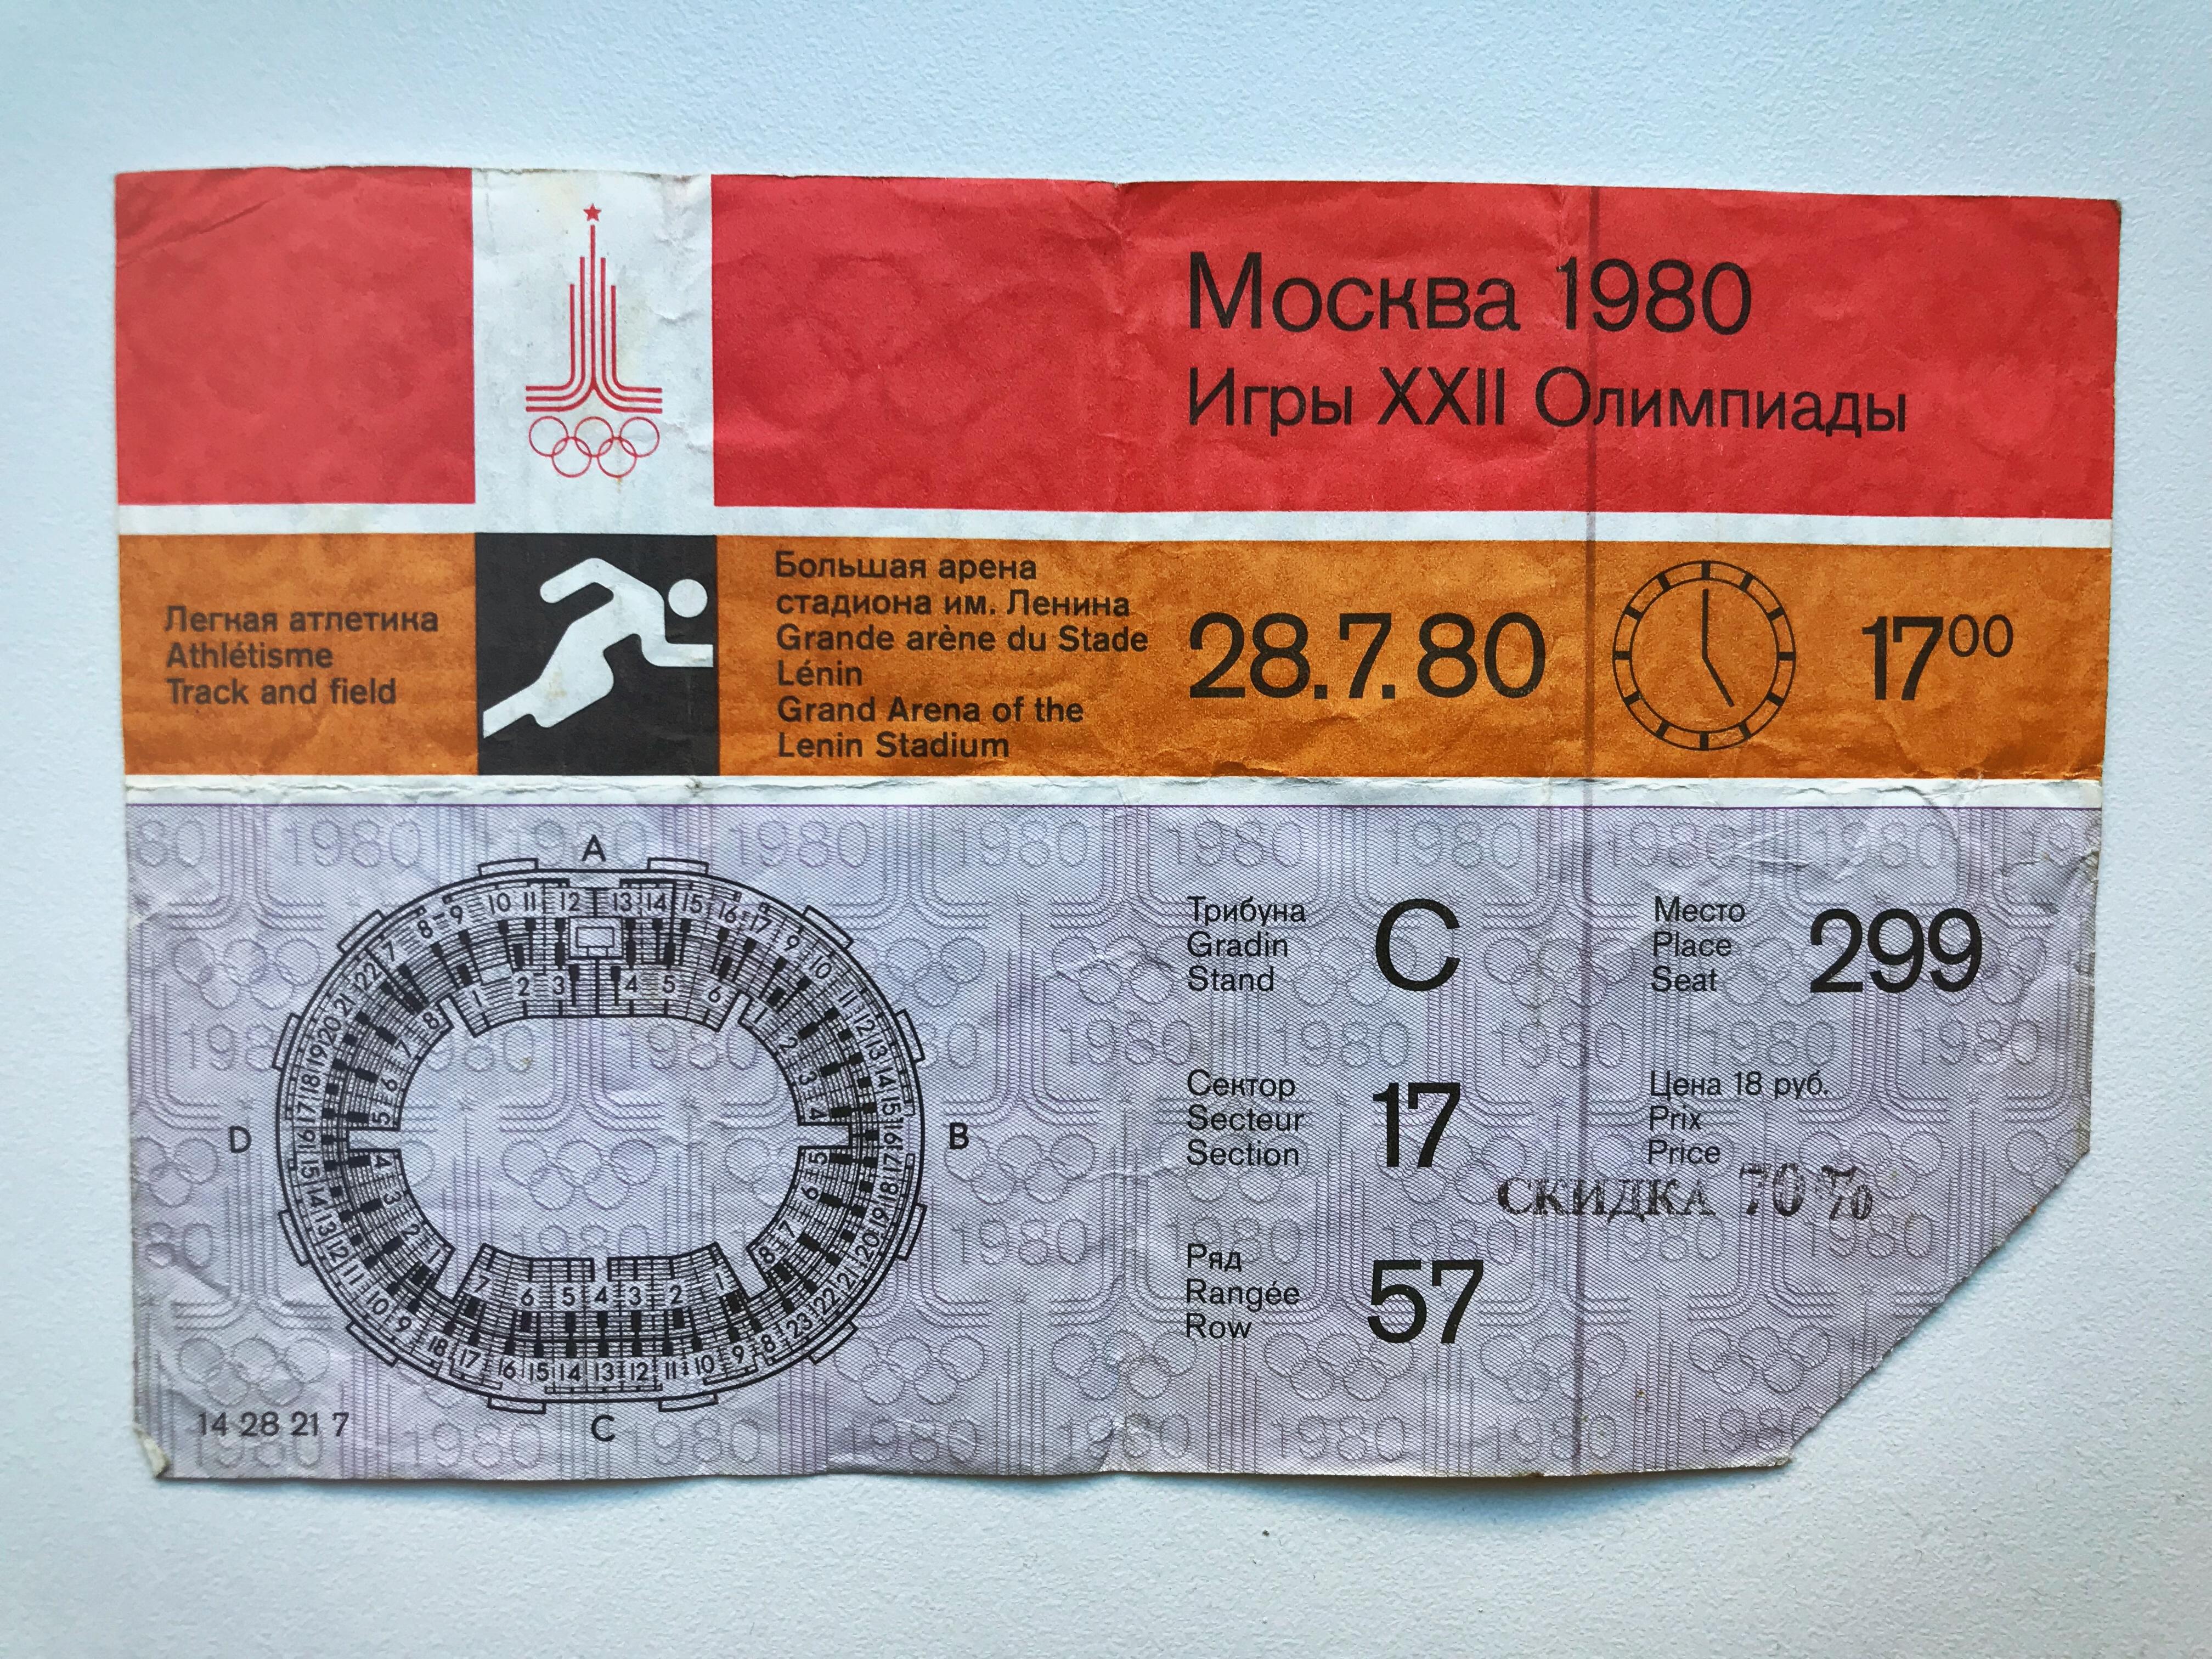 kscheib olympia 1980 moskau eintrittskarte